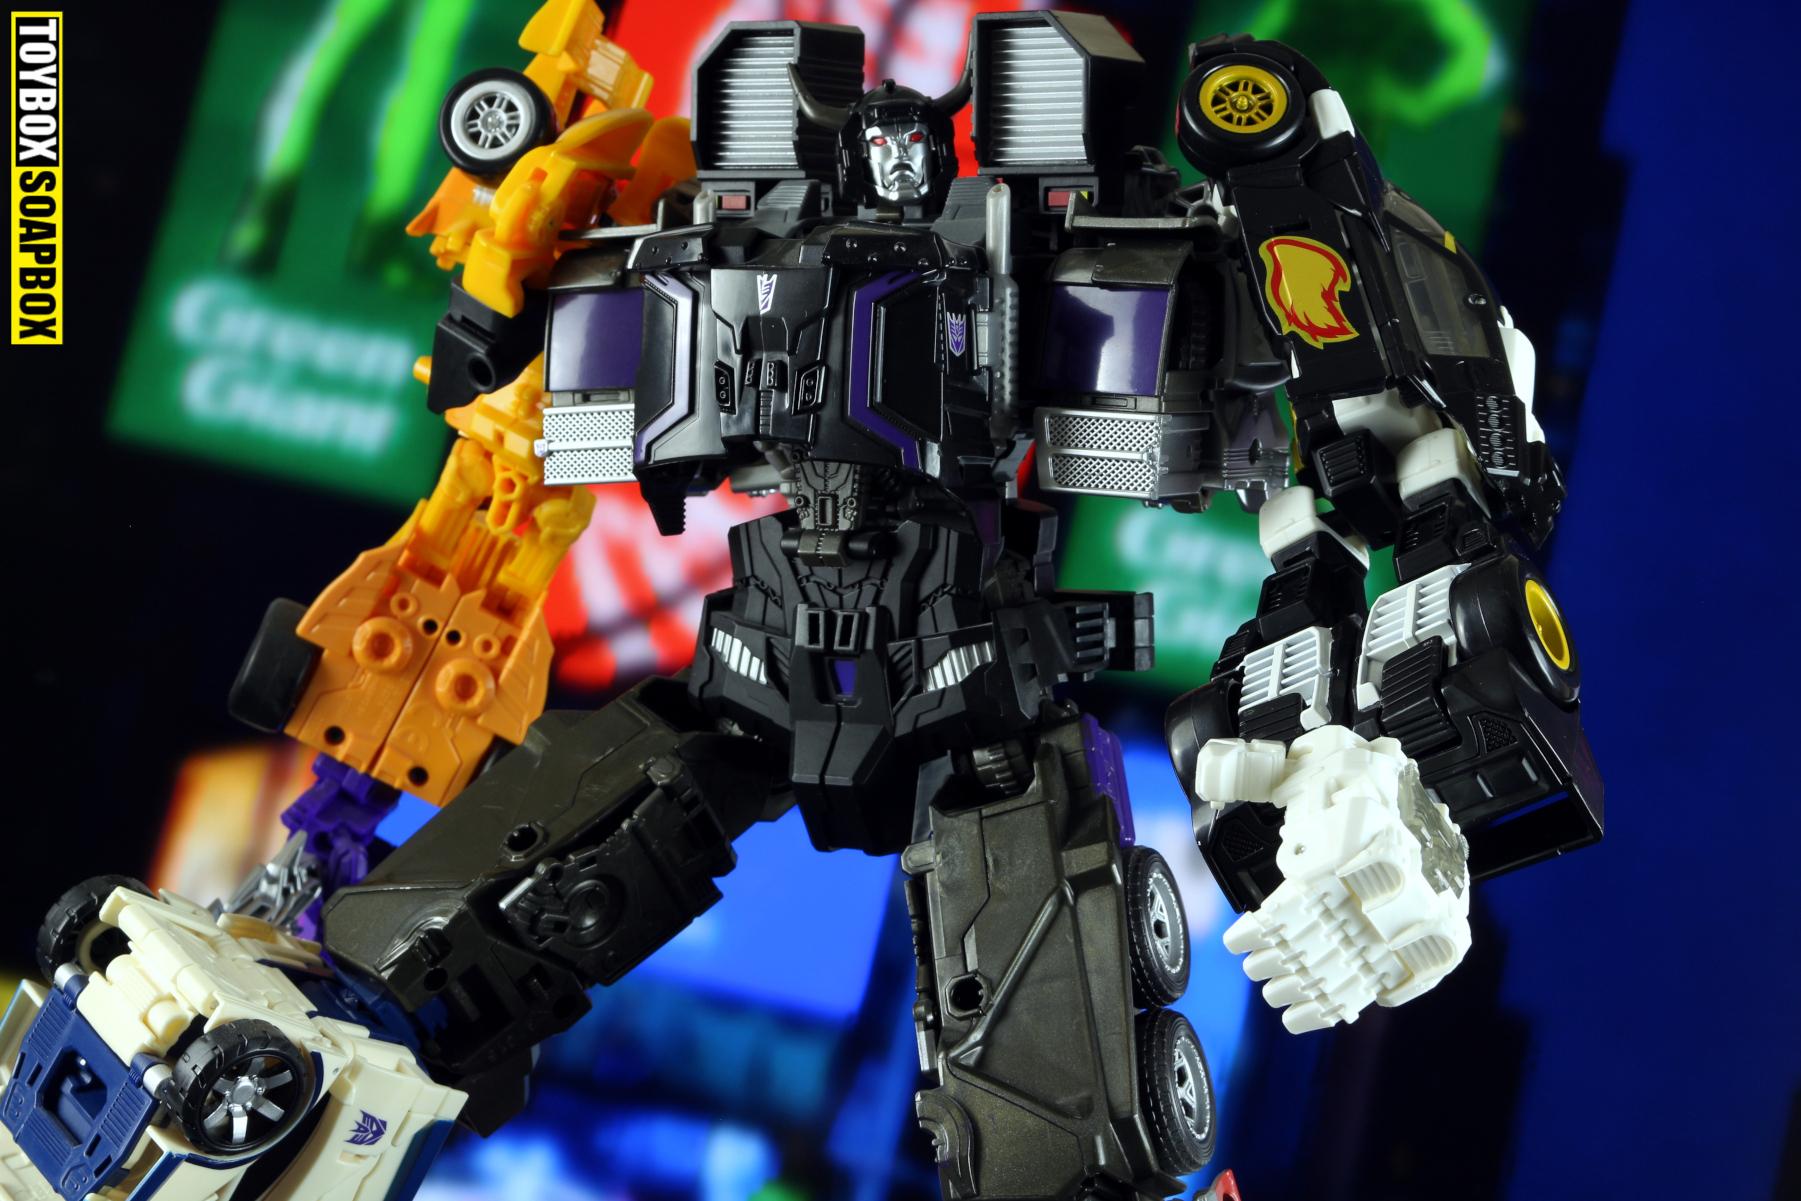 combiner wars menasor potp ricochet combiner arm